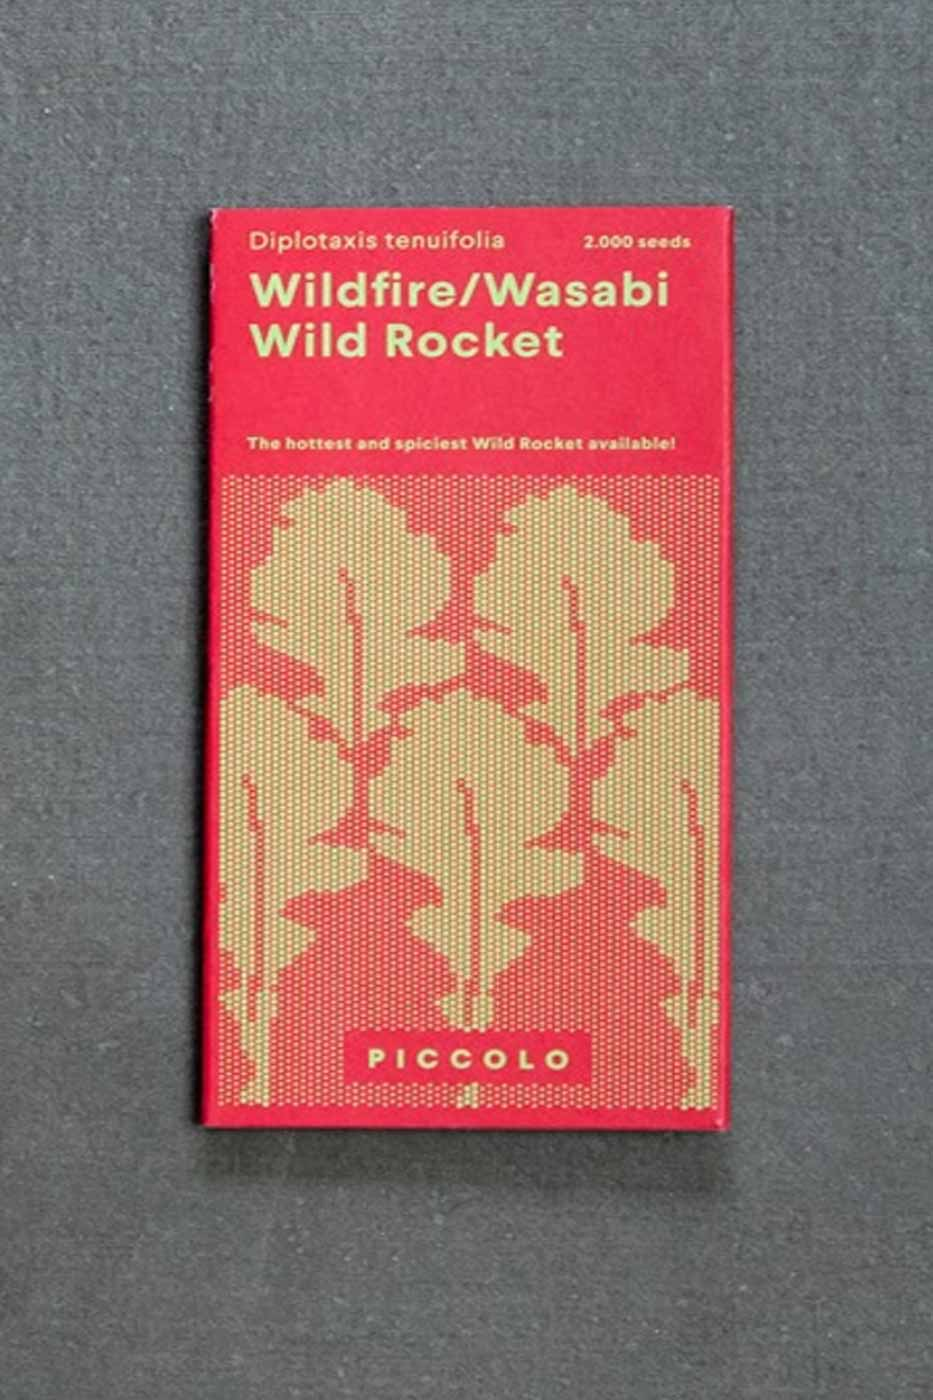 Fröpåse Wild Rocket Wildfire/Wasabi